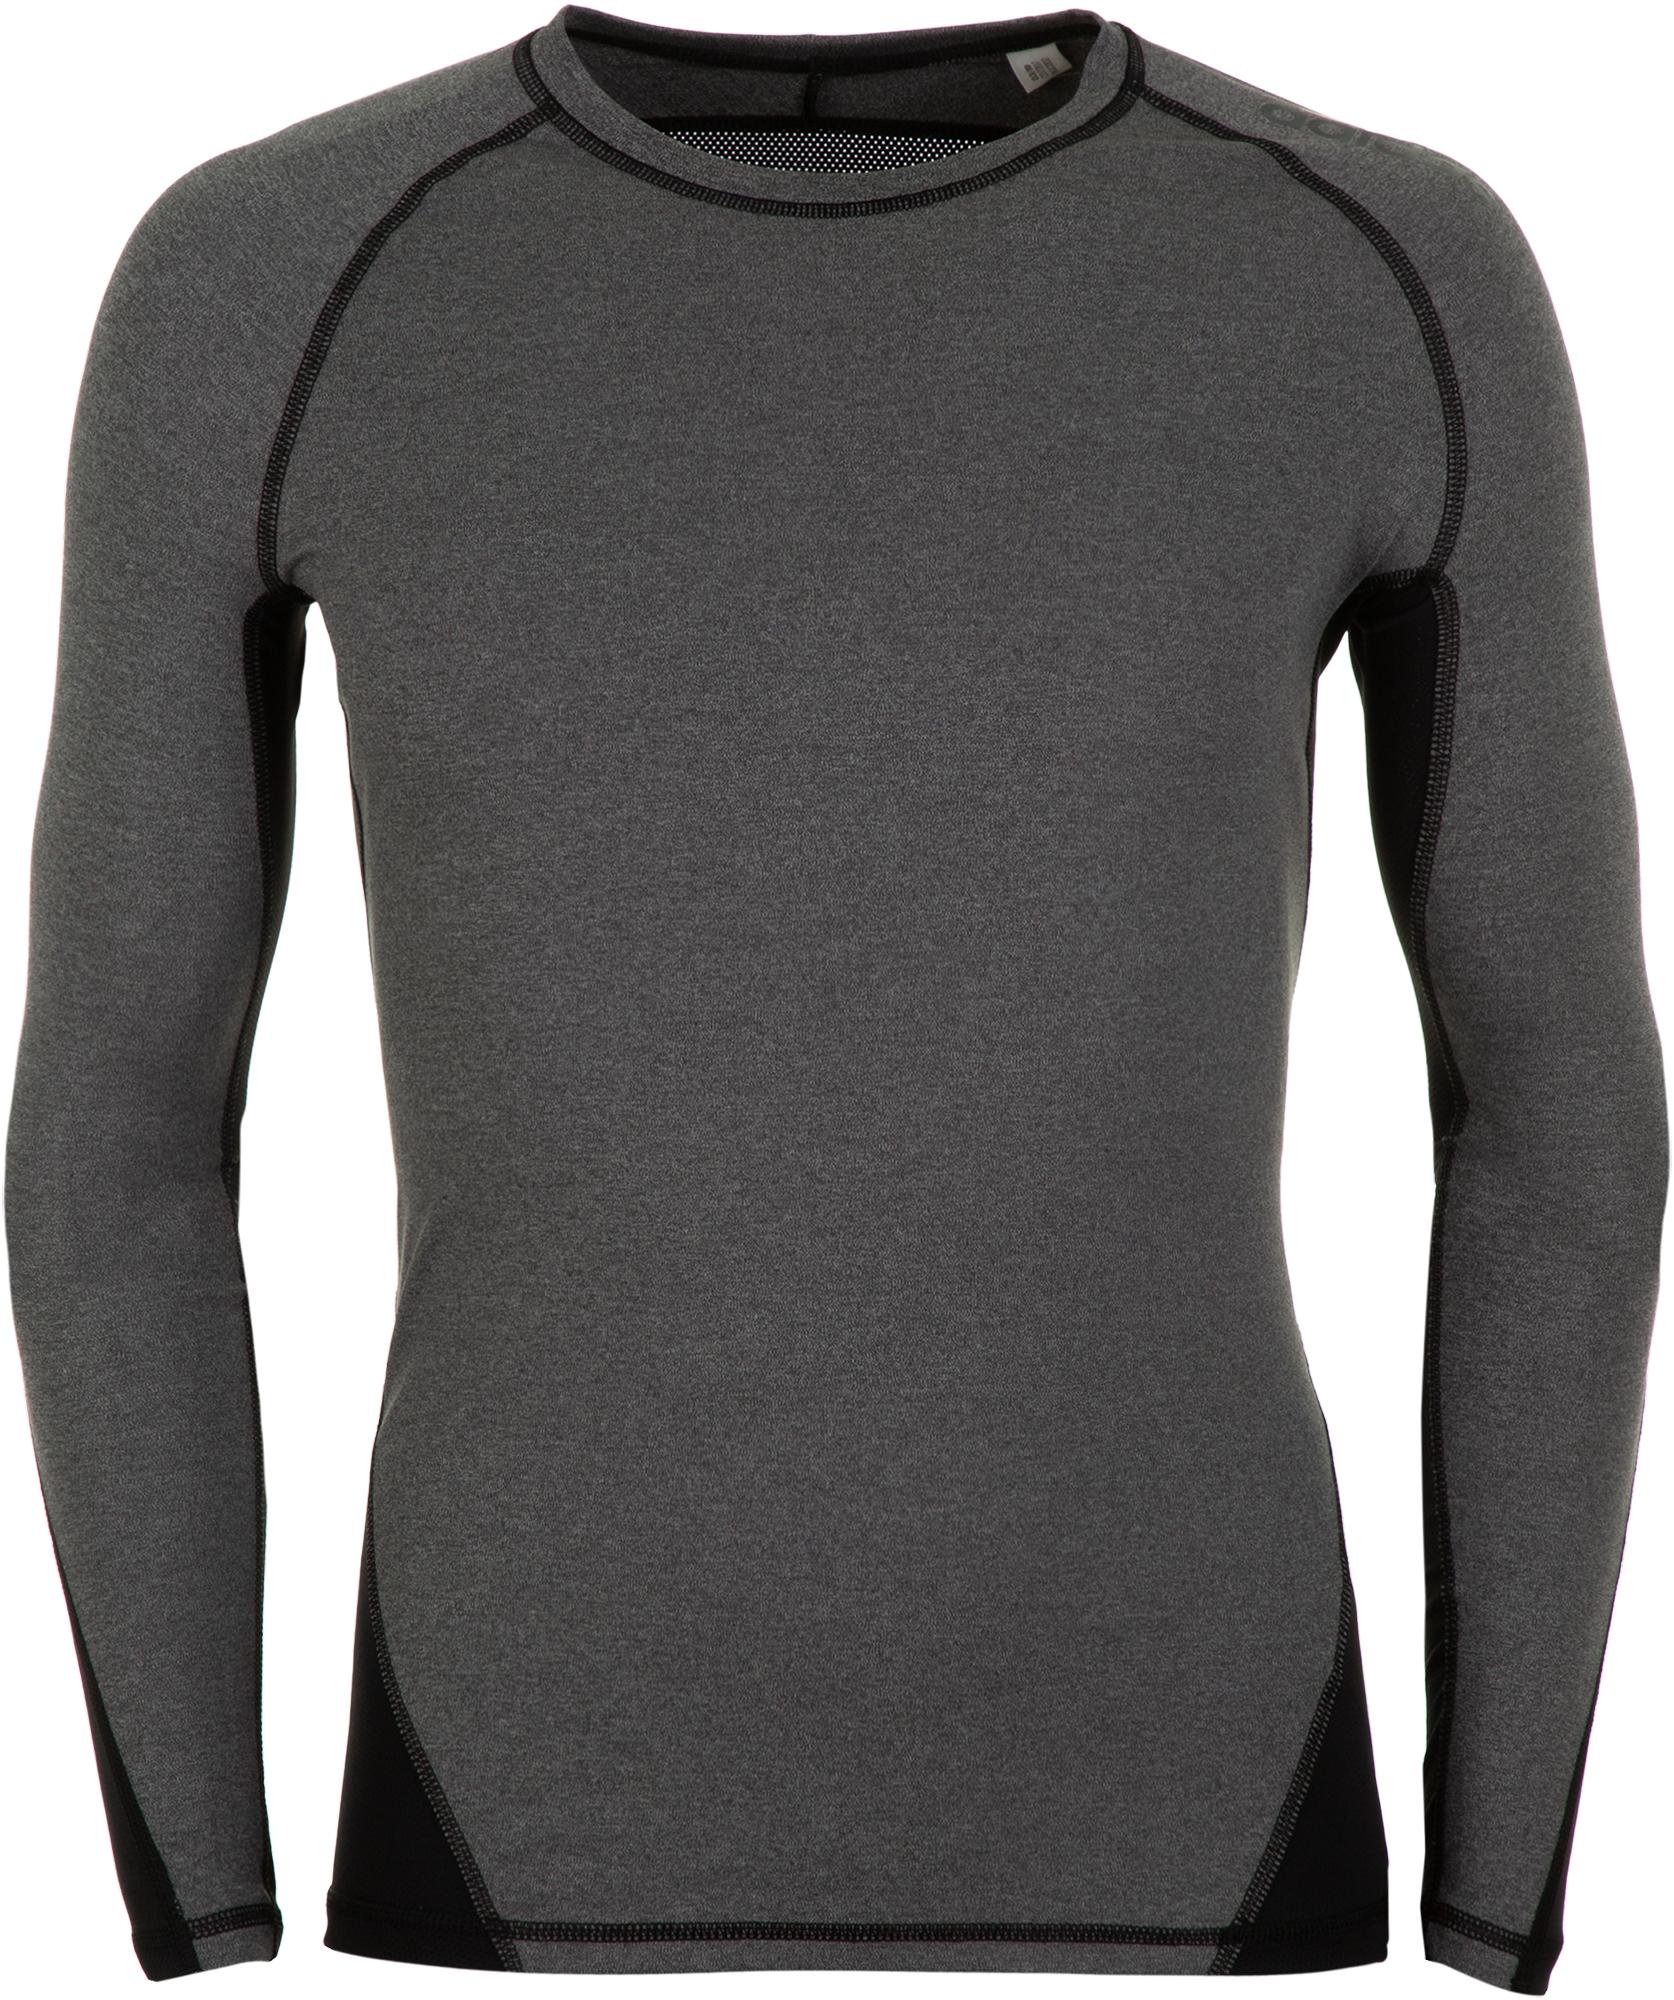 Adidas Лонгслив мужской Alphaskin Sport Heather, размер 58